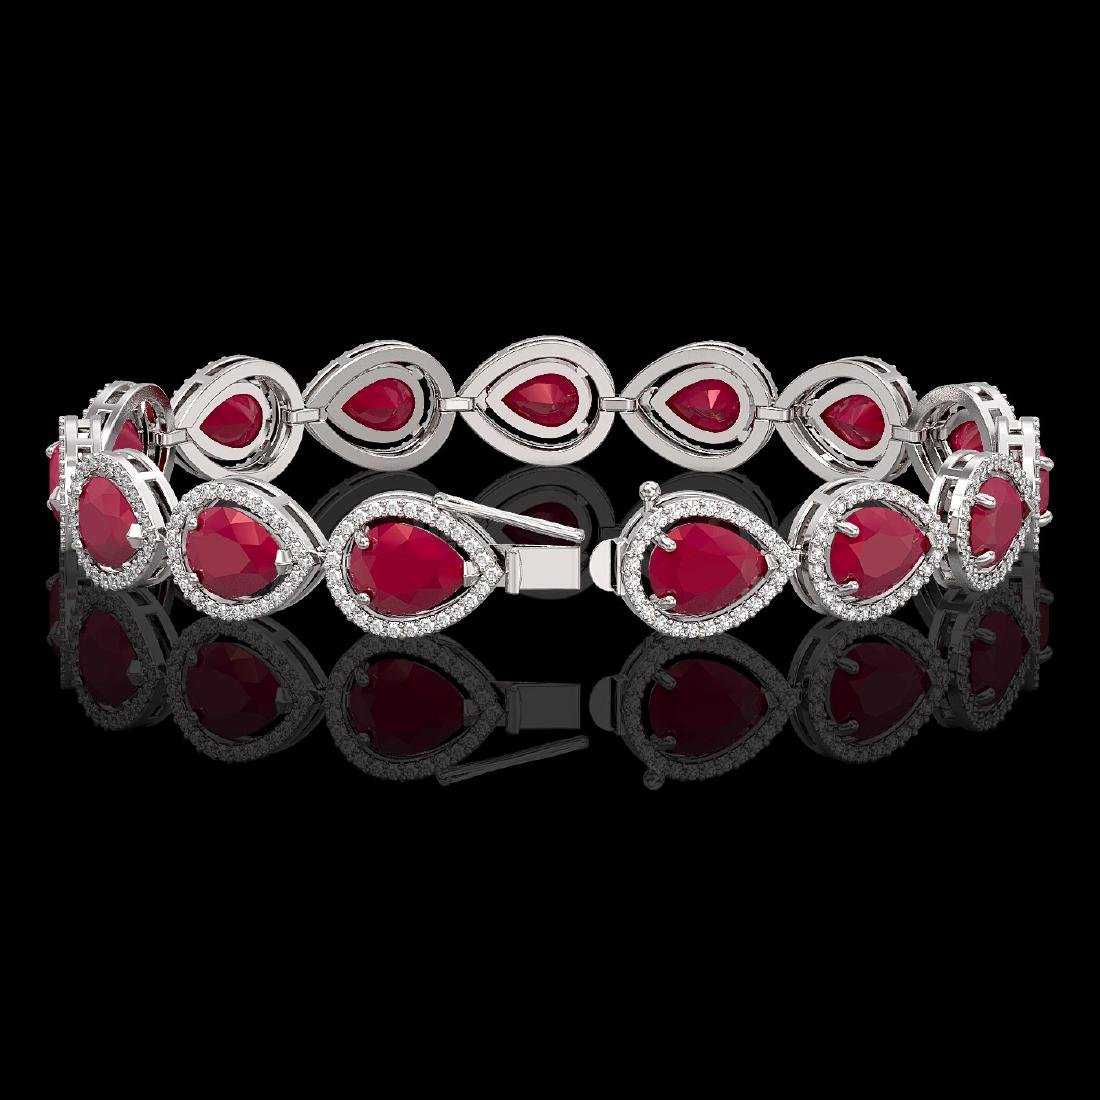 30.06 CTW Ruby & Diamond Halo Bracelet 10K White Gold - 2